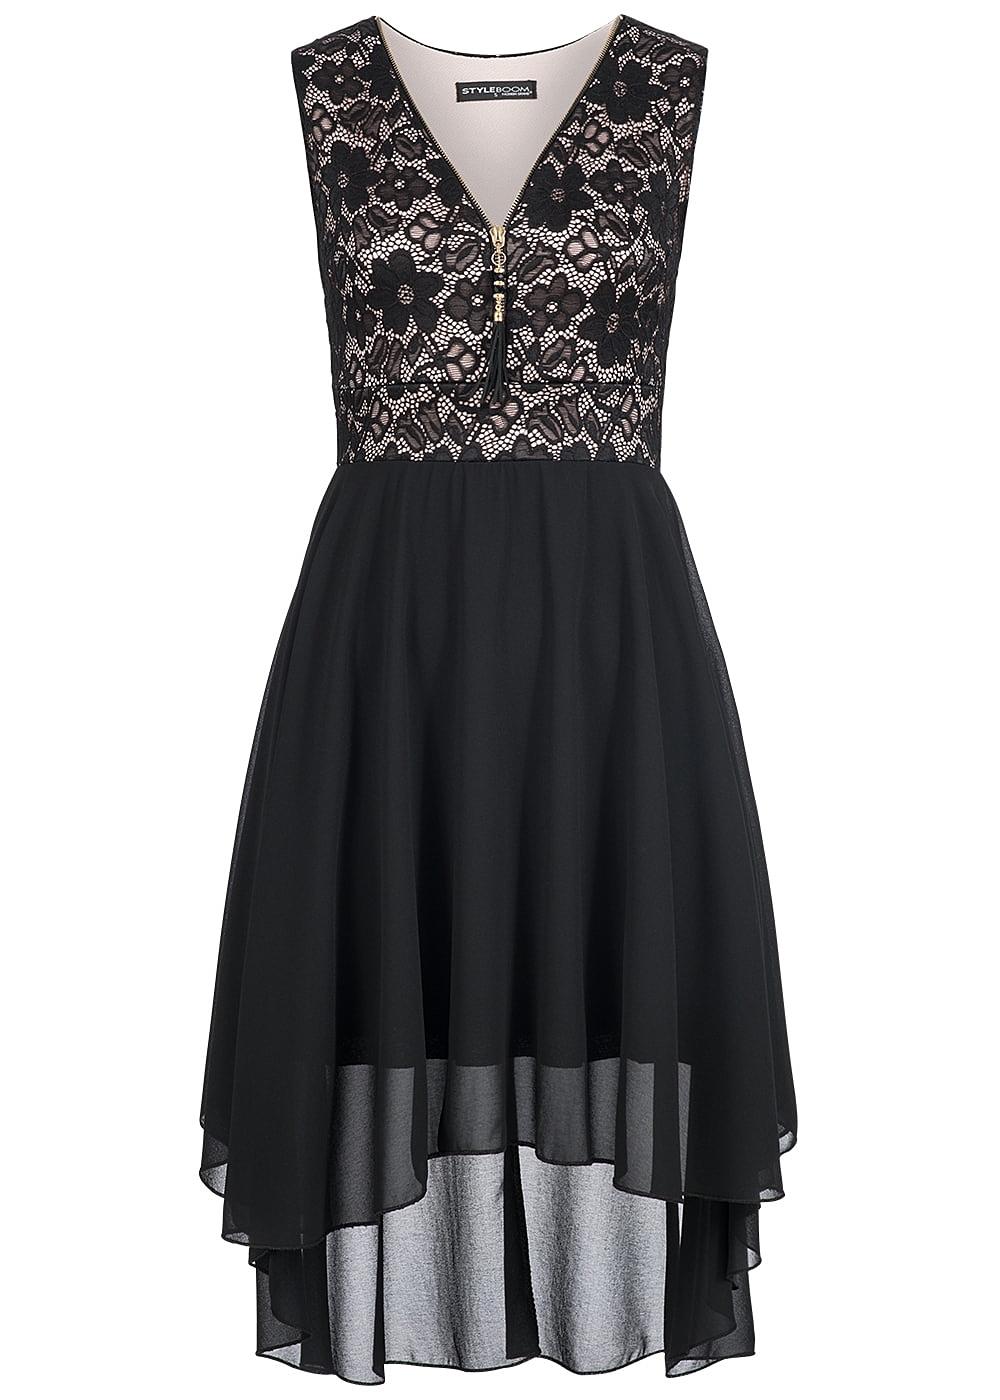 styleboom fashion damen kleid vokuhila zipper spitze. Black Bedroom Furniture Sets. Home Design Ideas